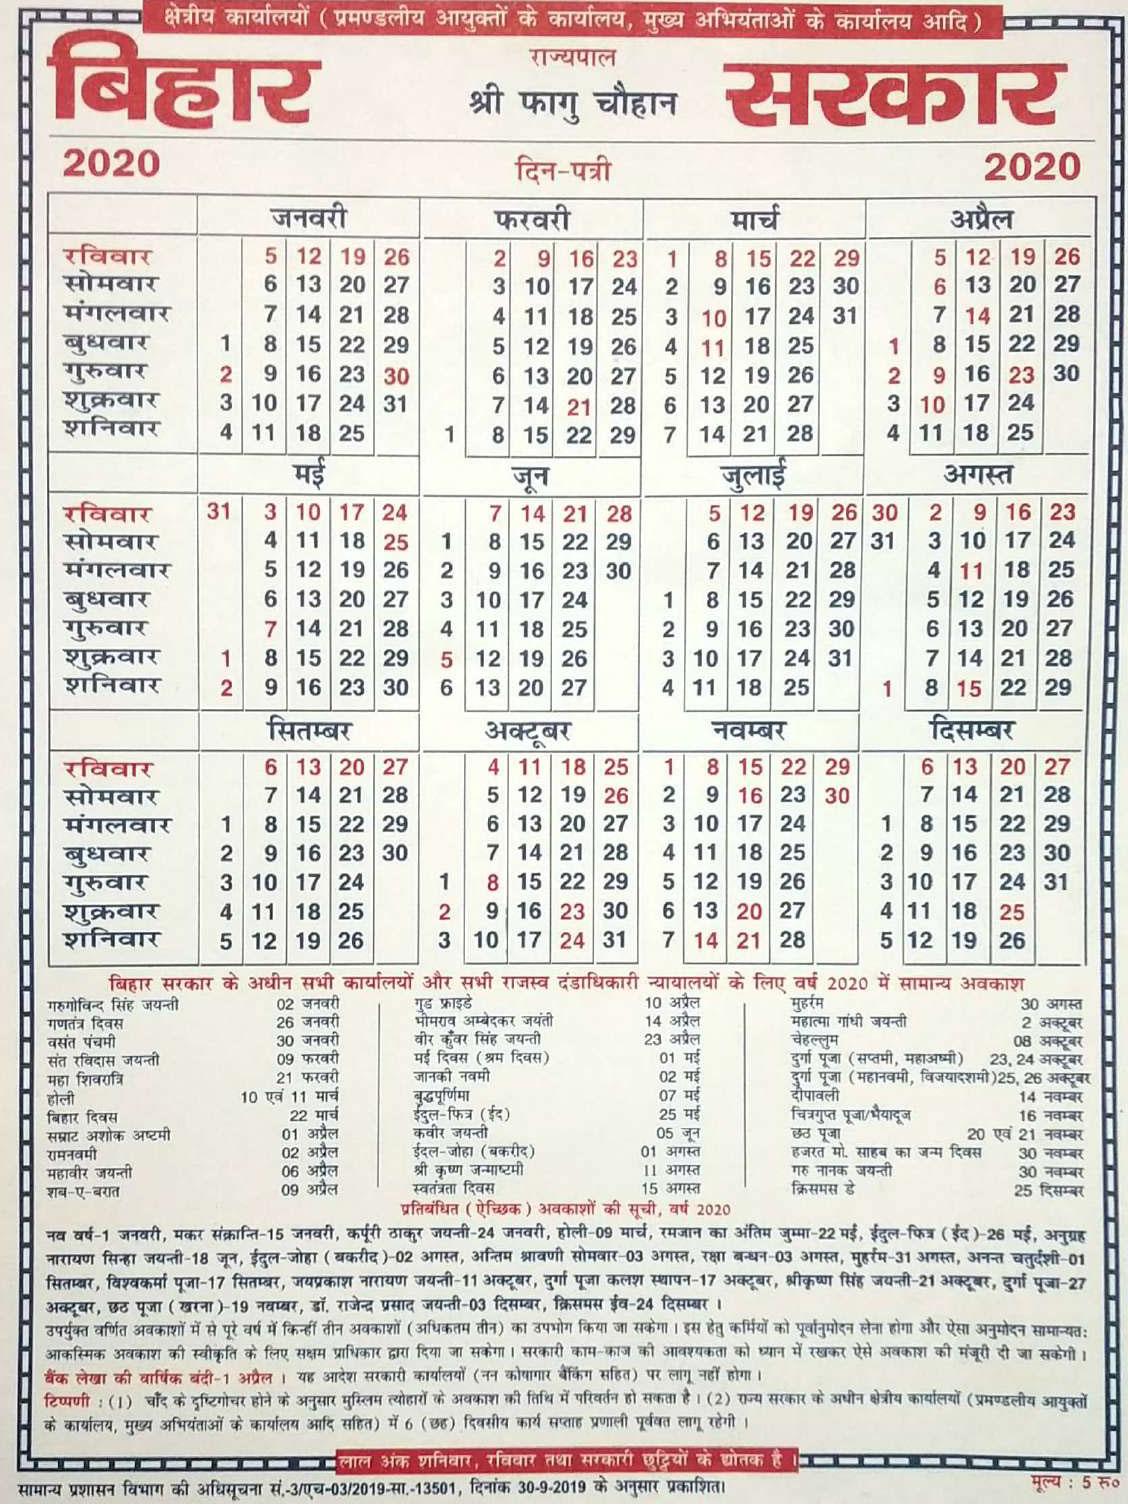 Bihar Sarkar Calendar 2021 Pdf | Seg regarding Bihar Government Calender